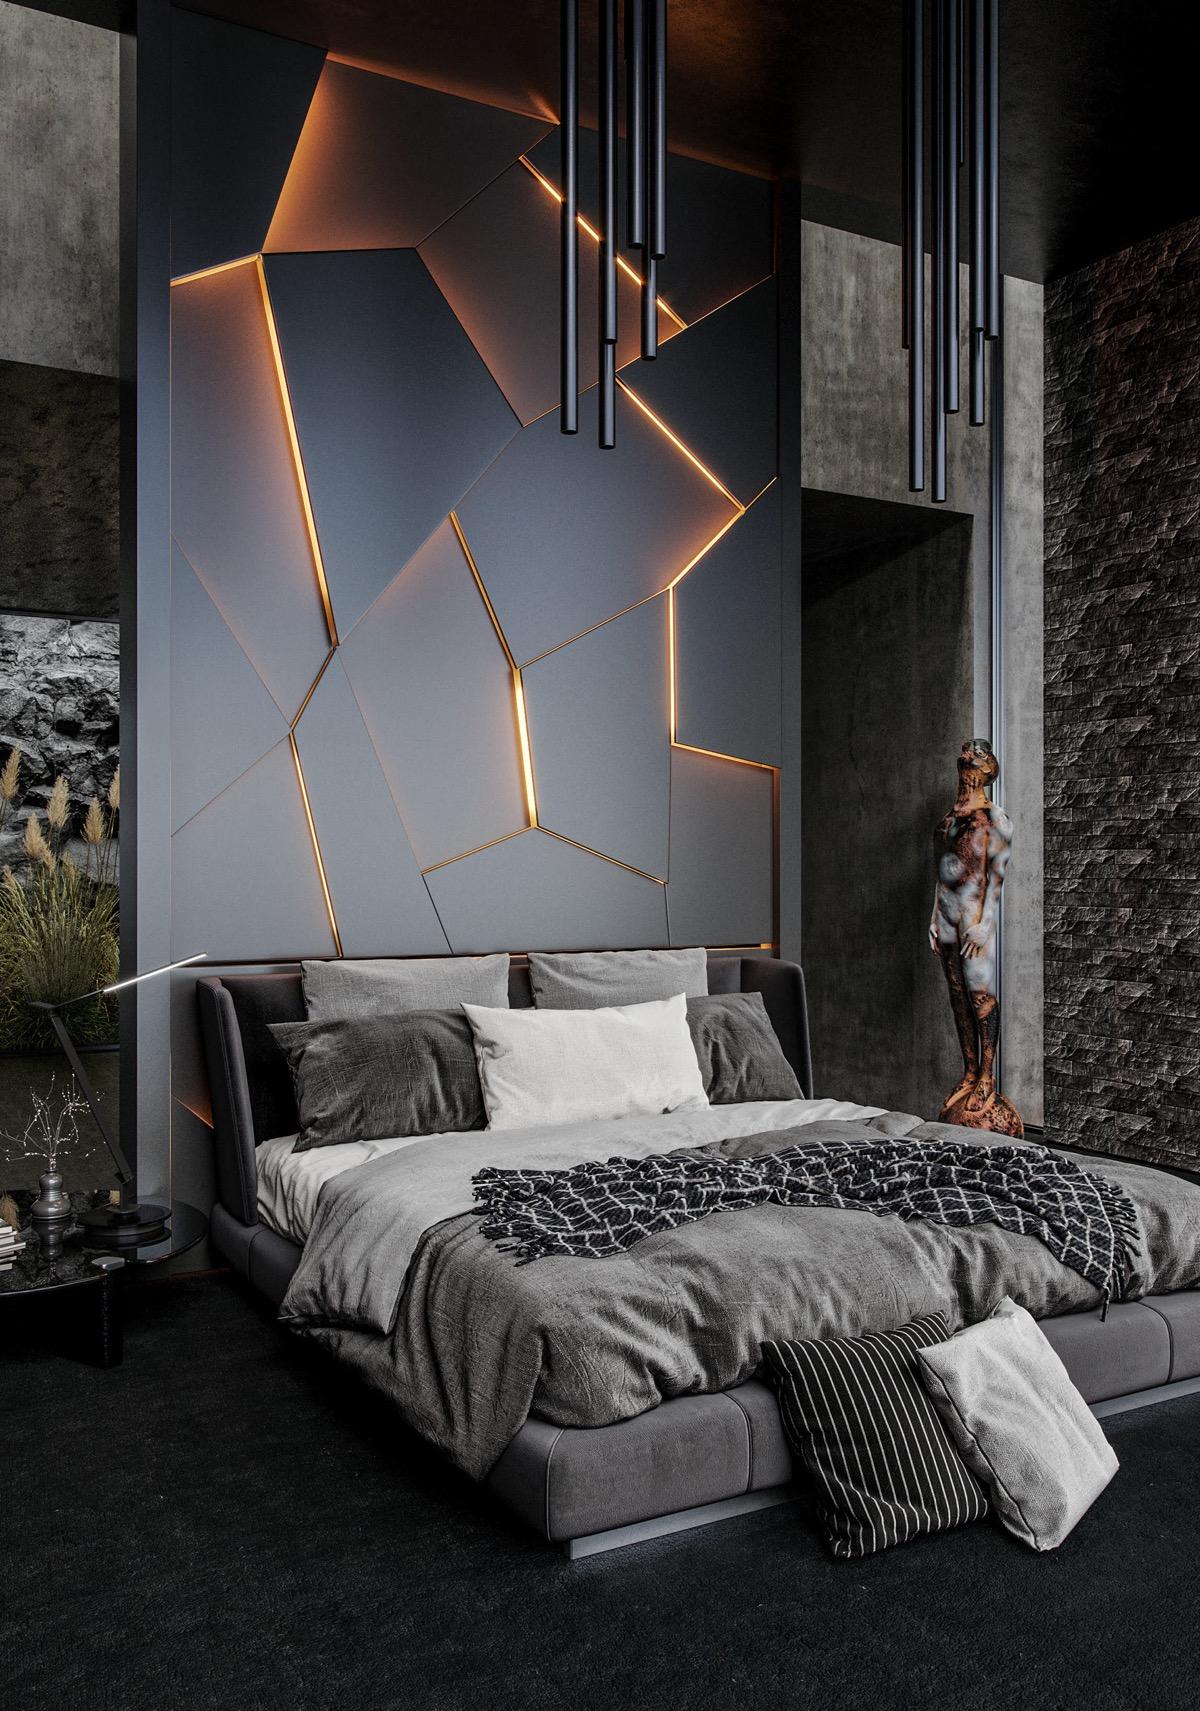 illuminated-headboard-feature-wall